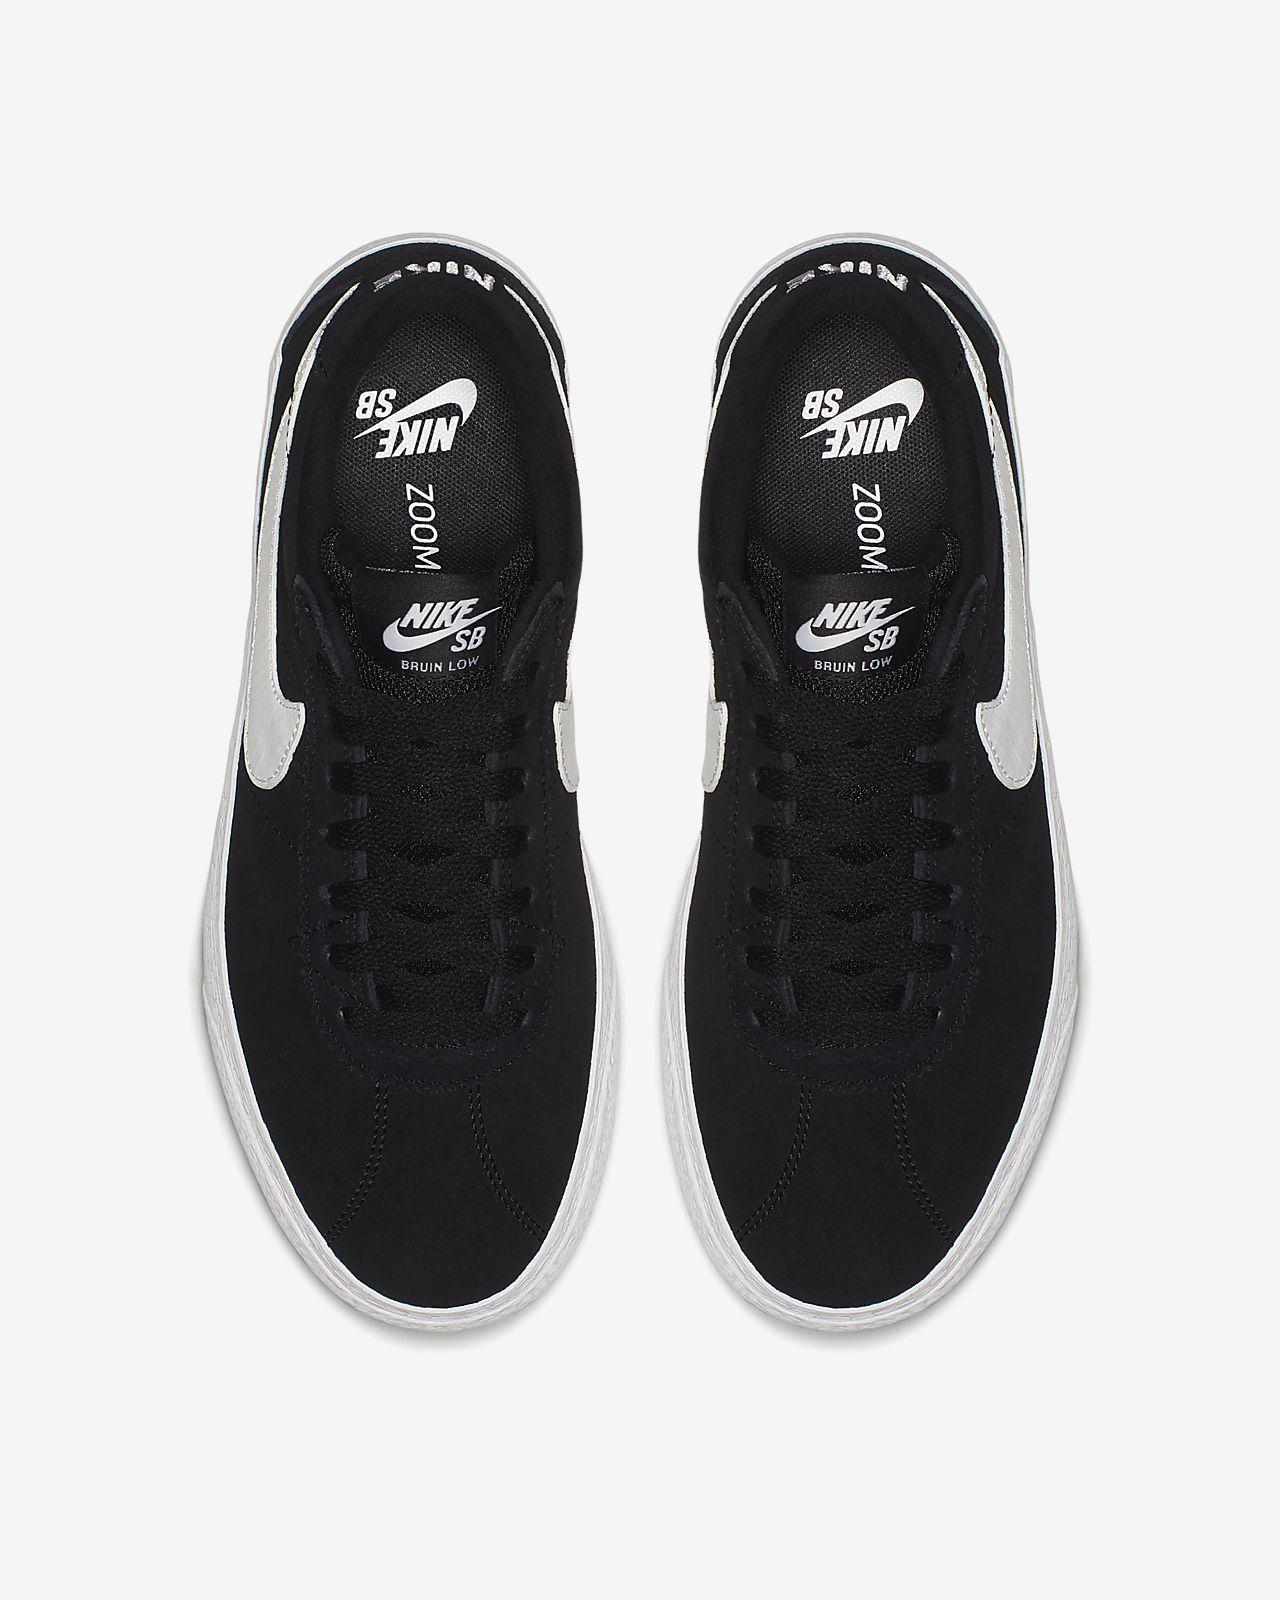 save off 3ab83 ca4c6 Nike SB Zoom Bruin Low Women's Skateboarding Shoe. Nike.com